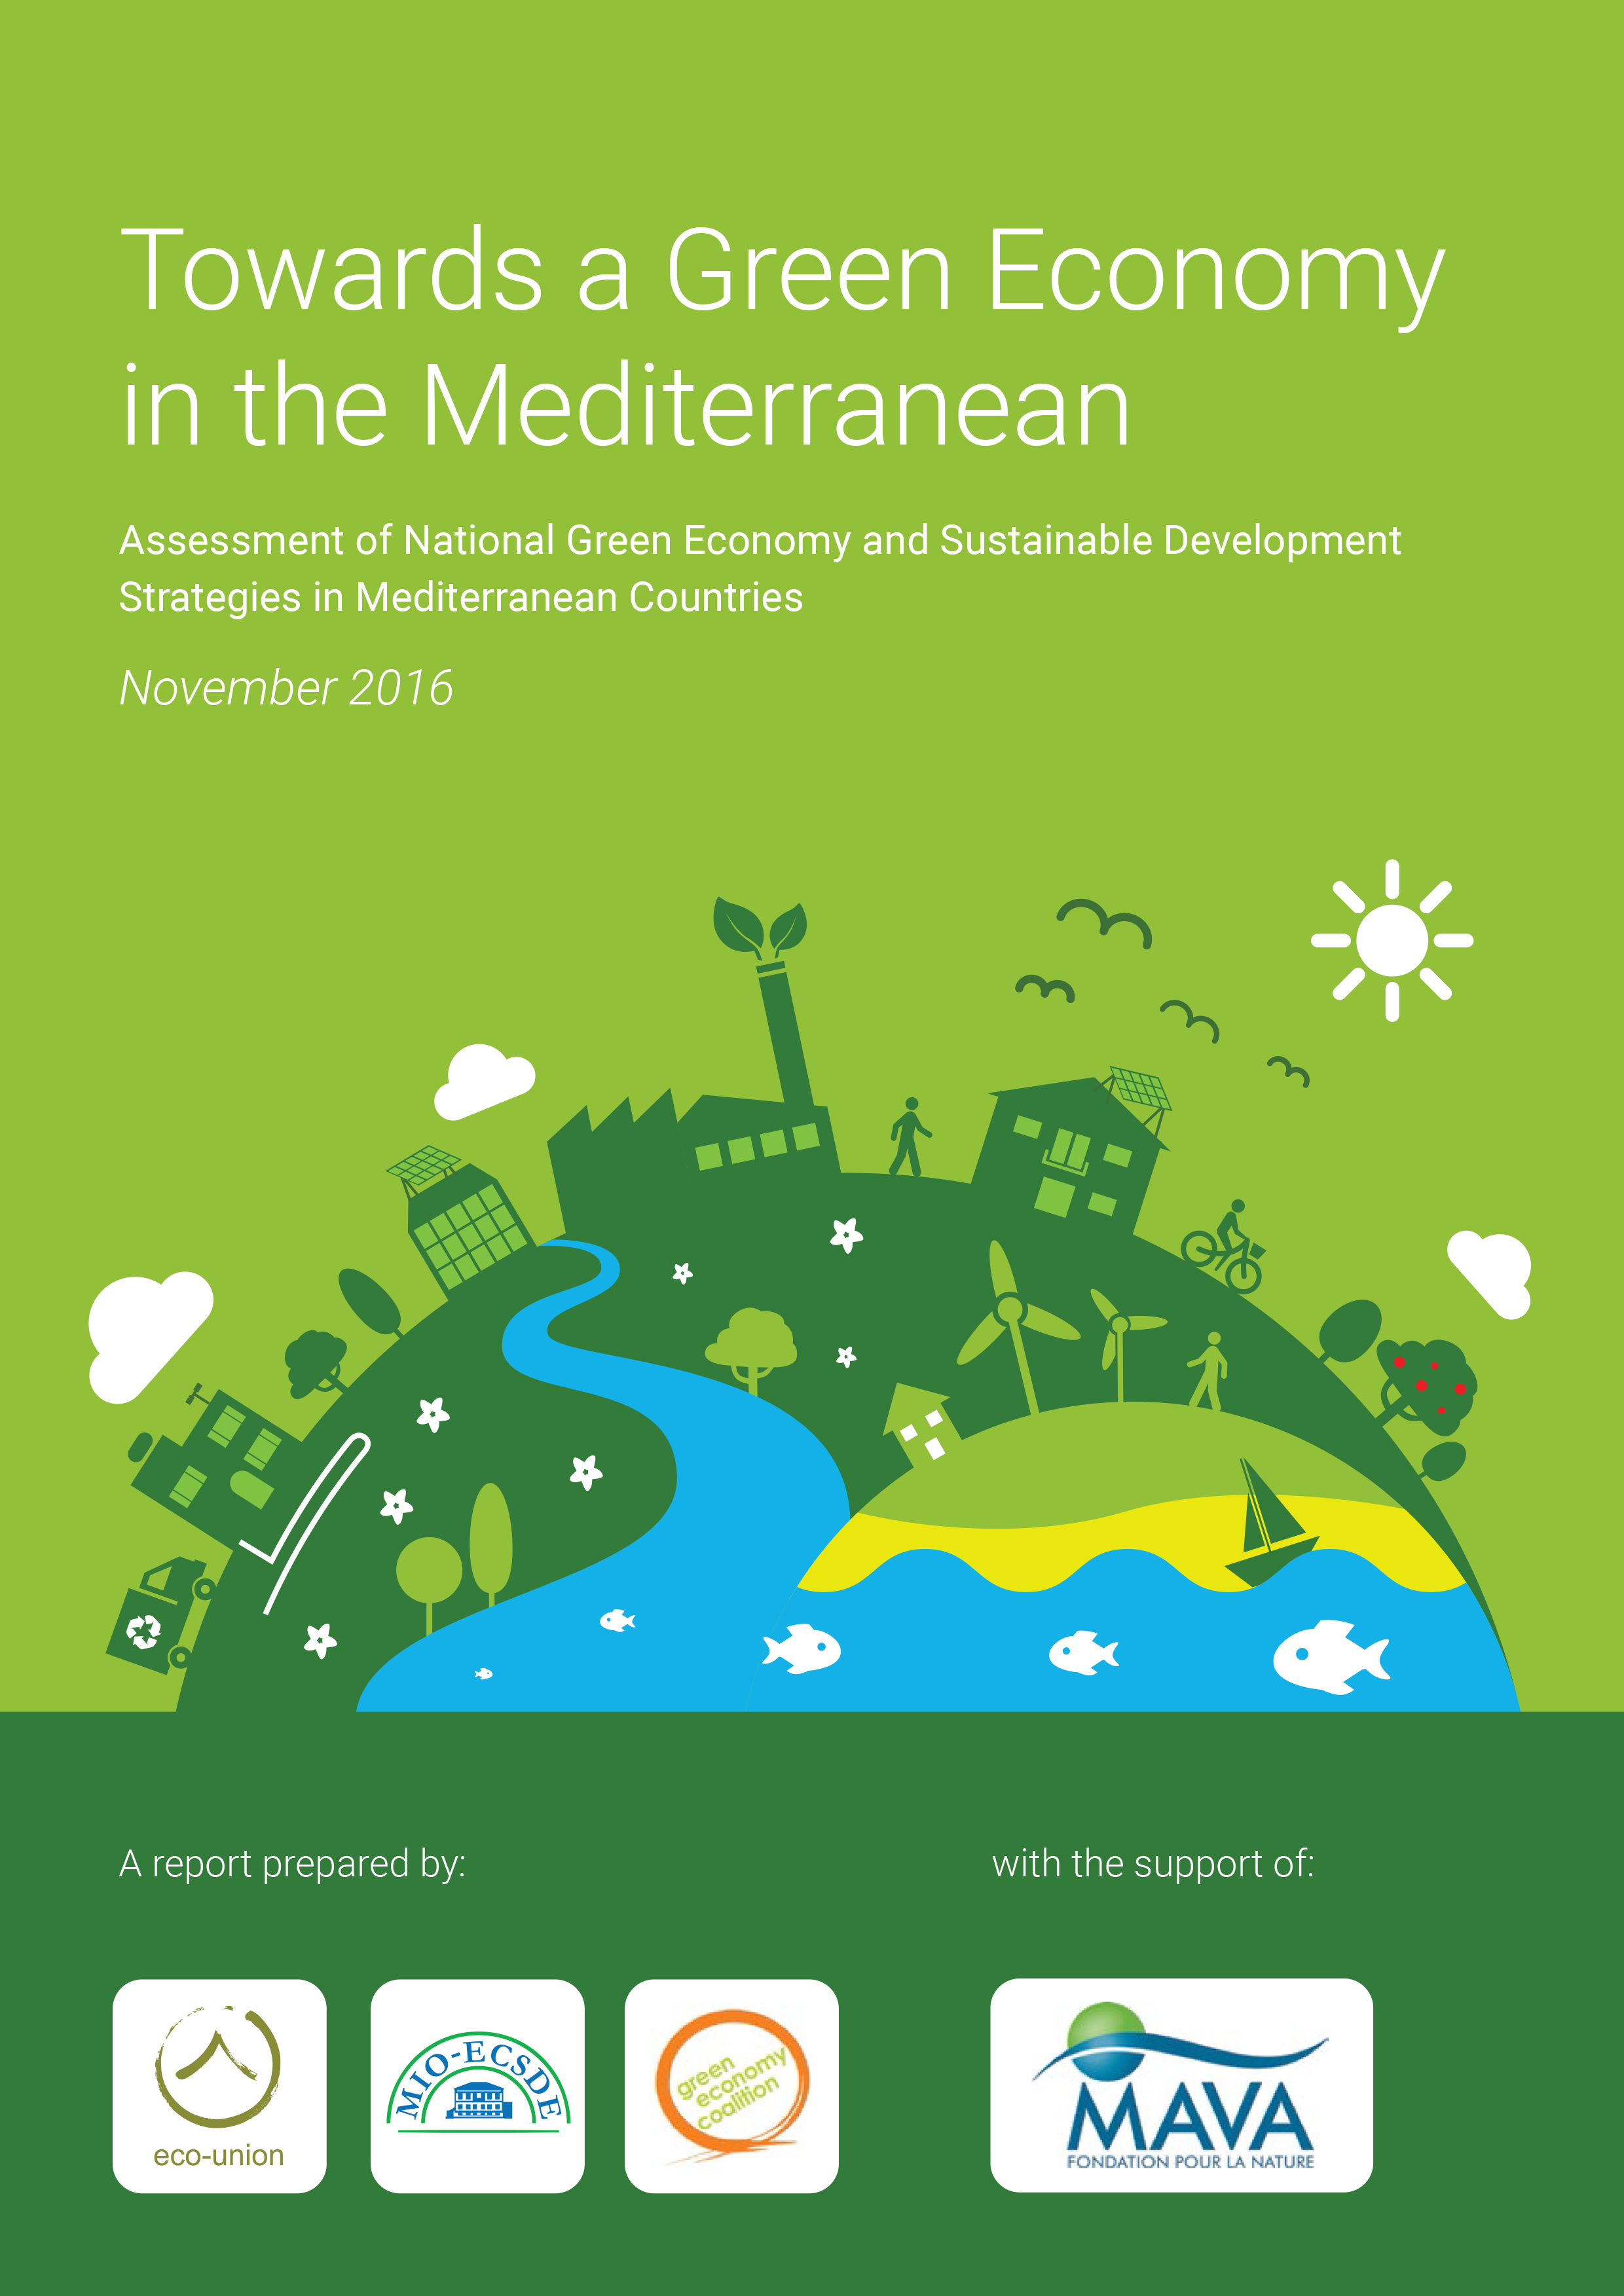 greeneconomy-med-web-1